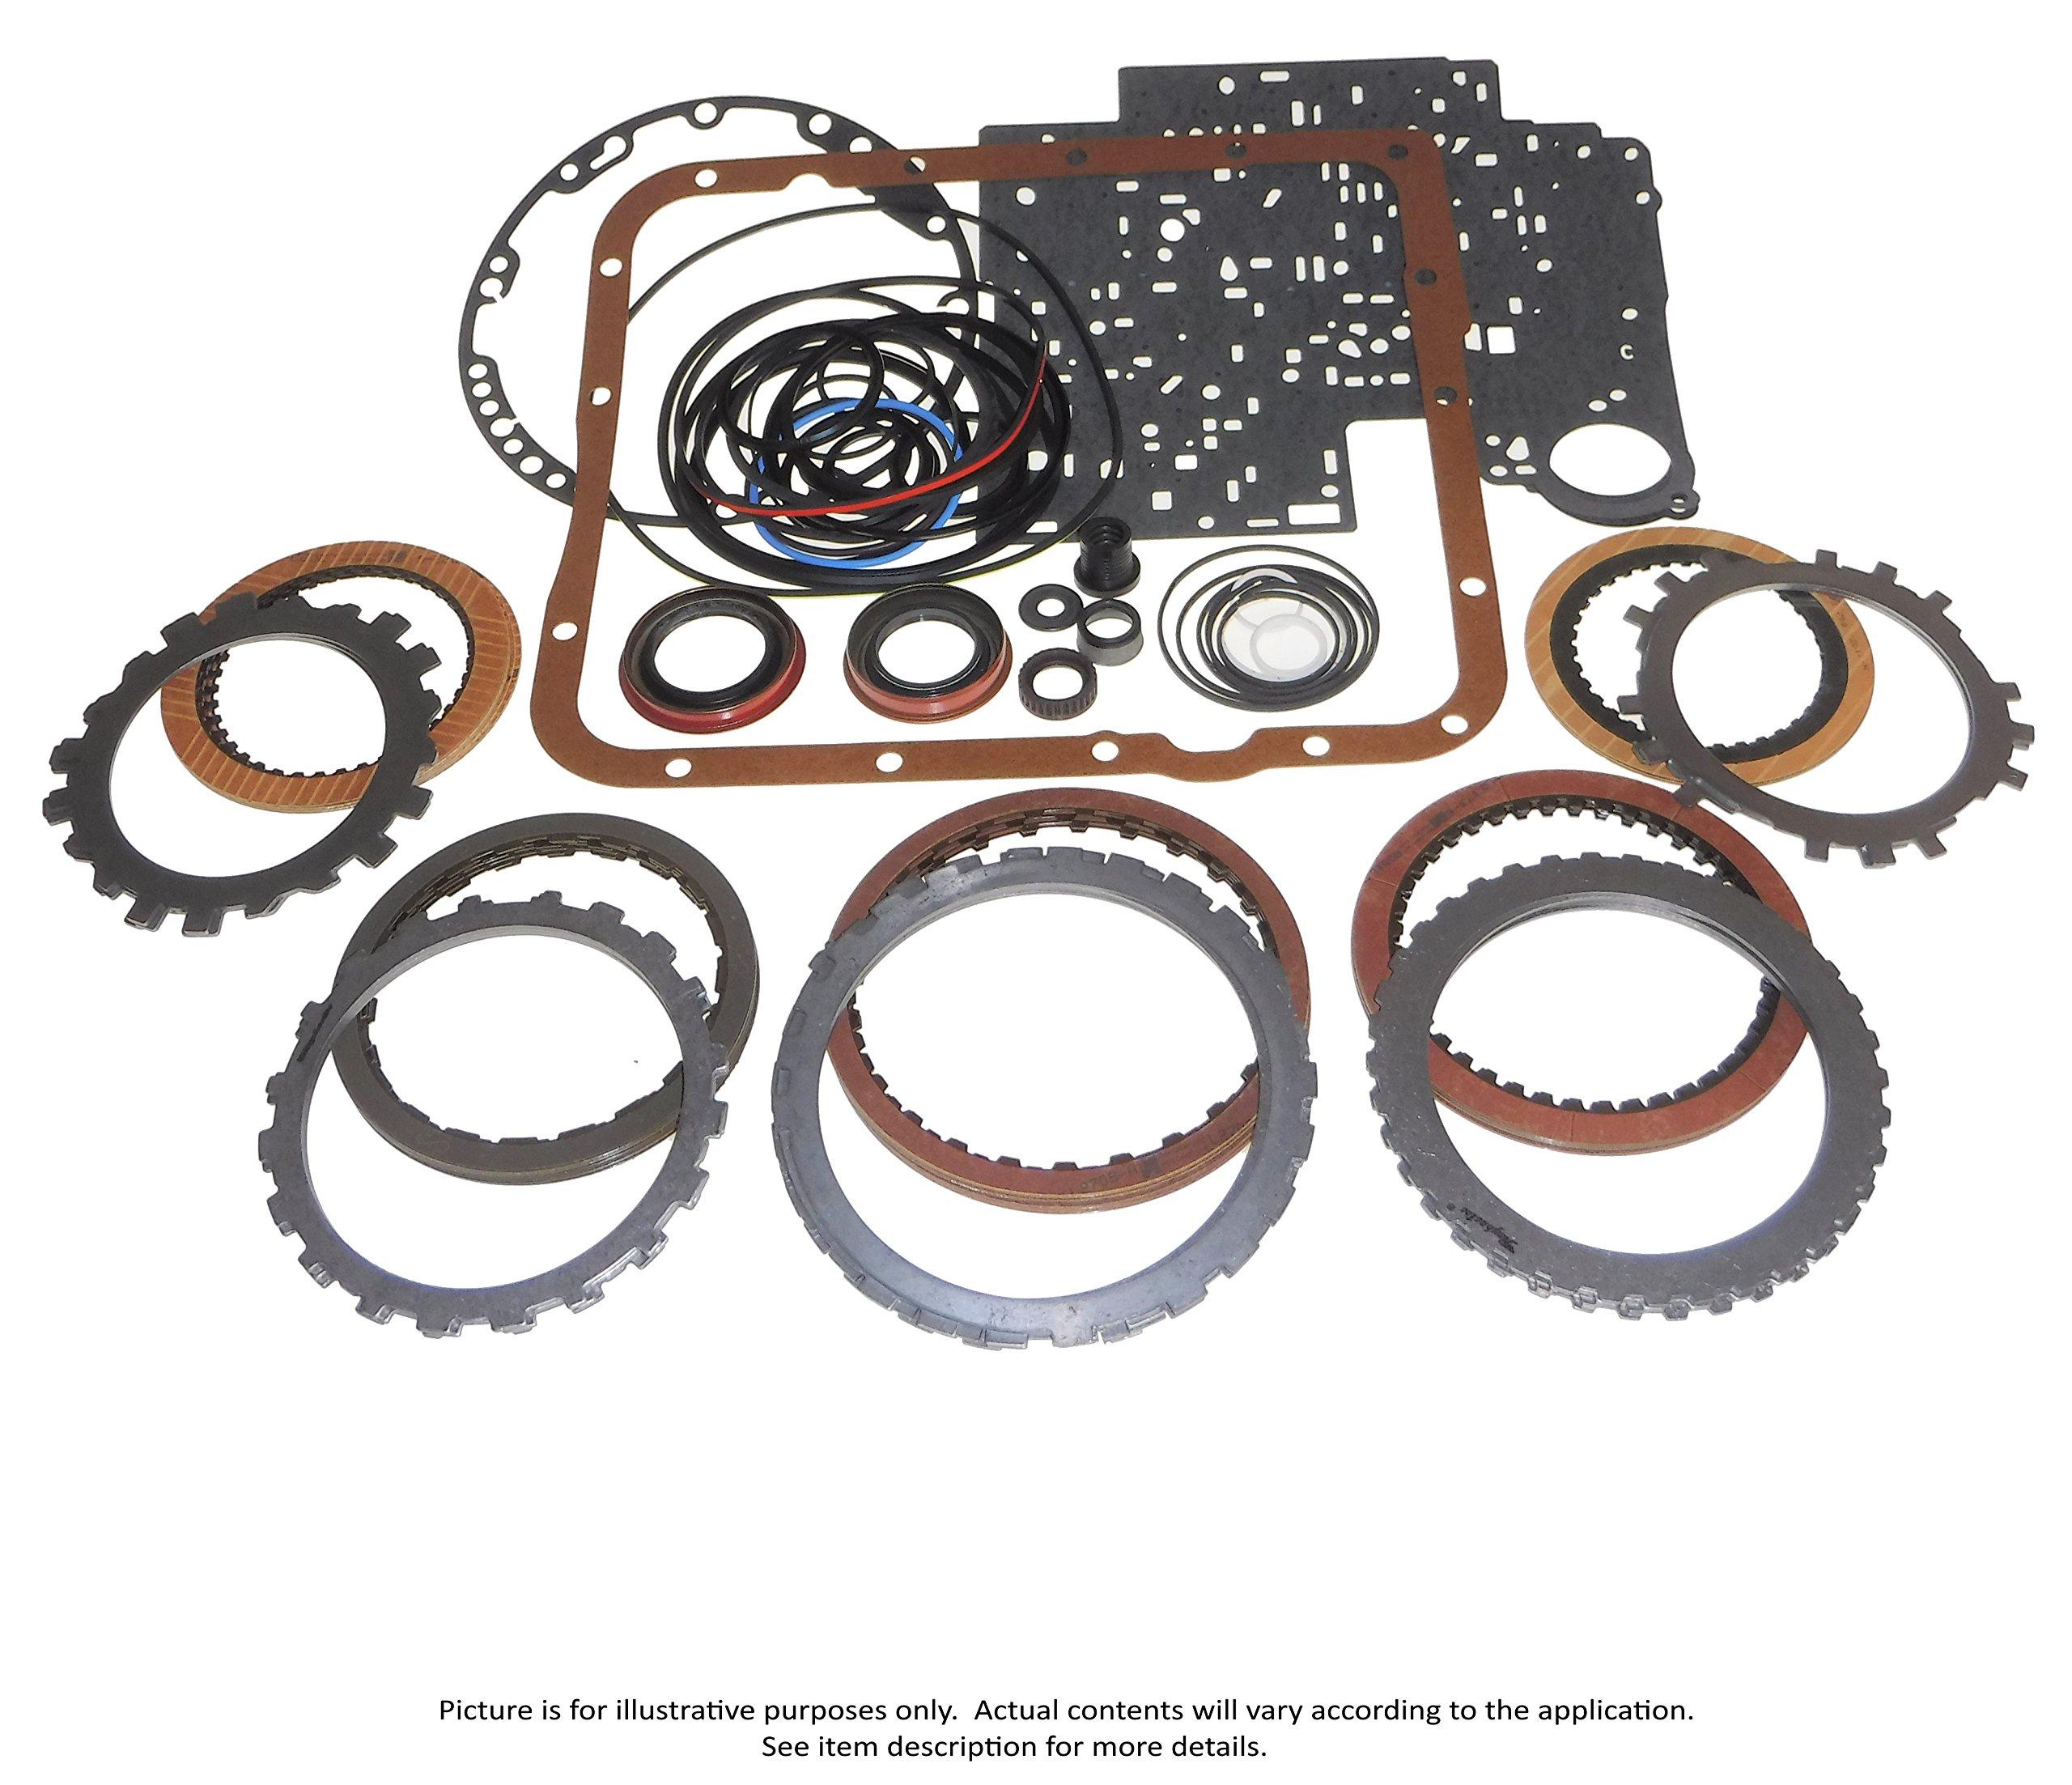 Transmaxx Transmission Rebuild Master Kit With Steels 42RLE 03-17